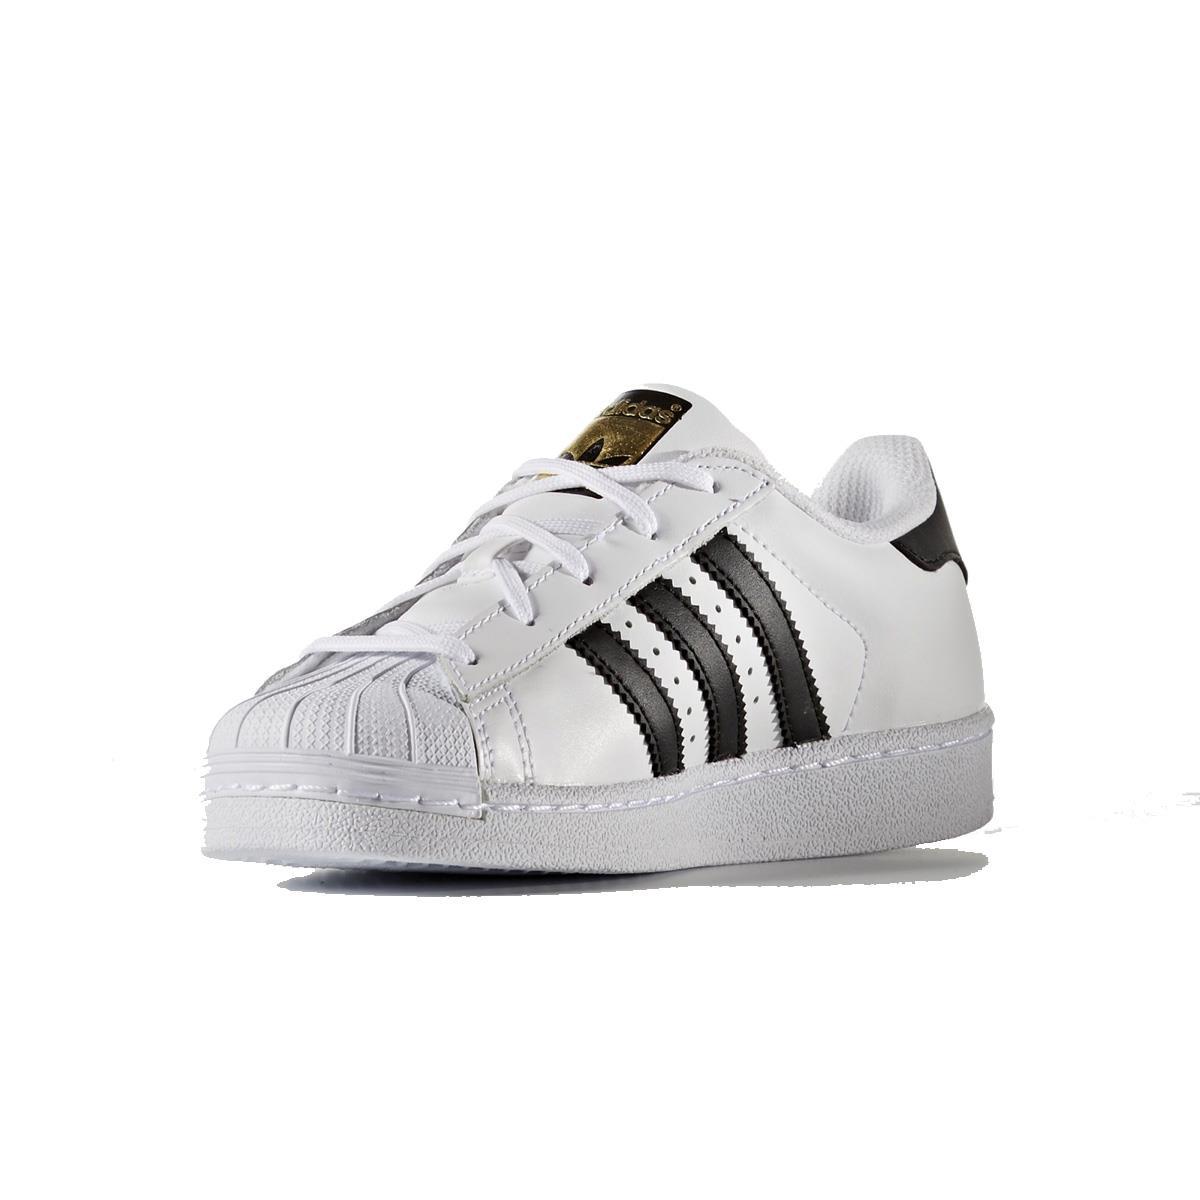 9eb1b4f3c Tênis Adidas Superstar Foundation Infantil Branco